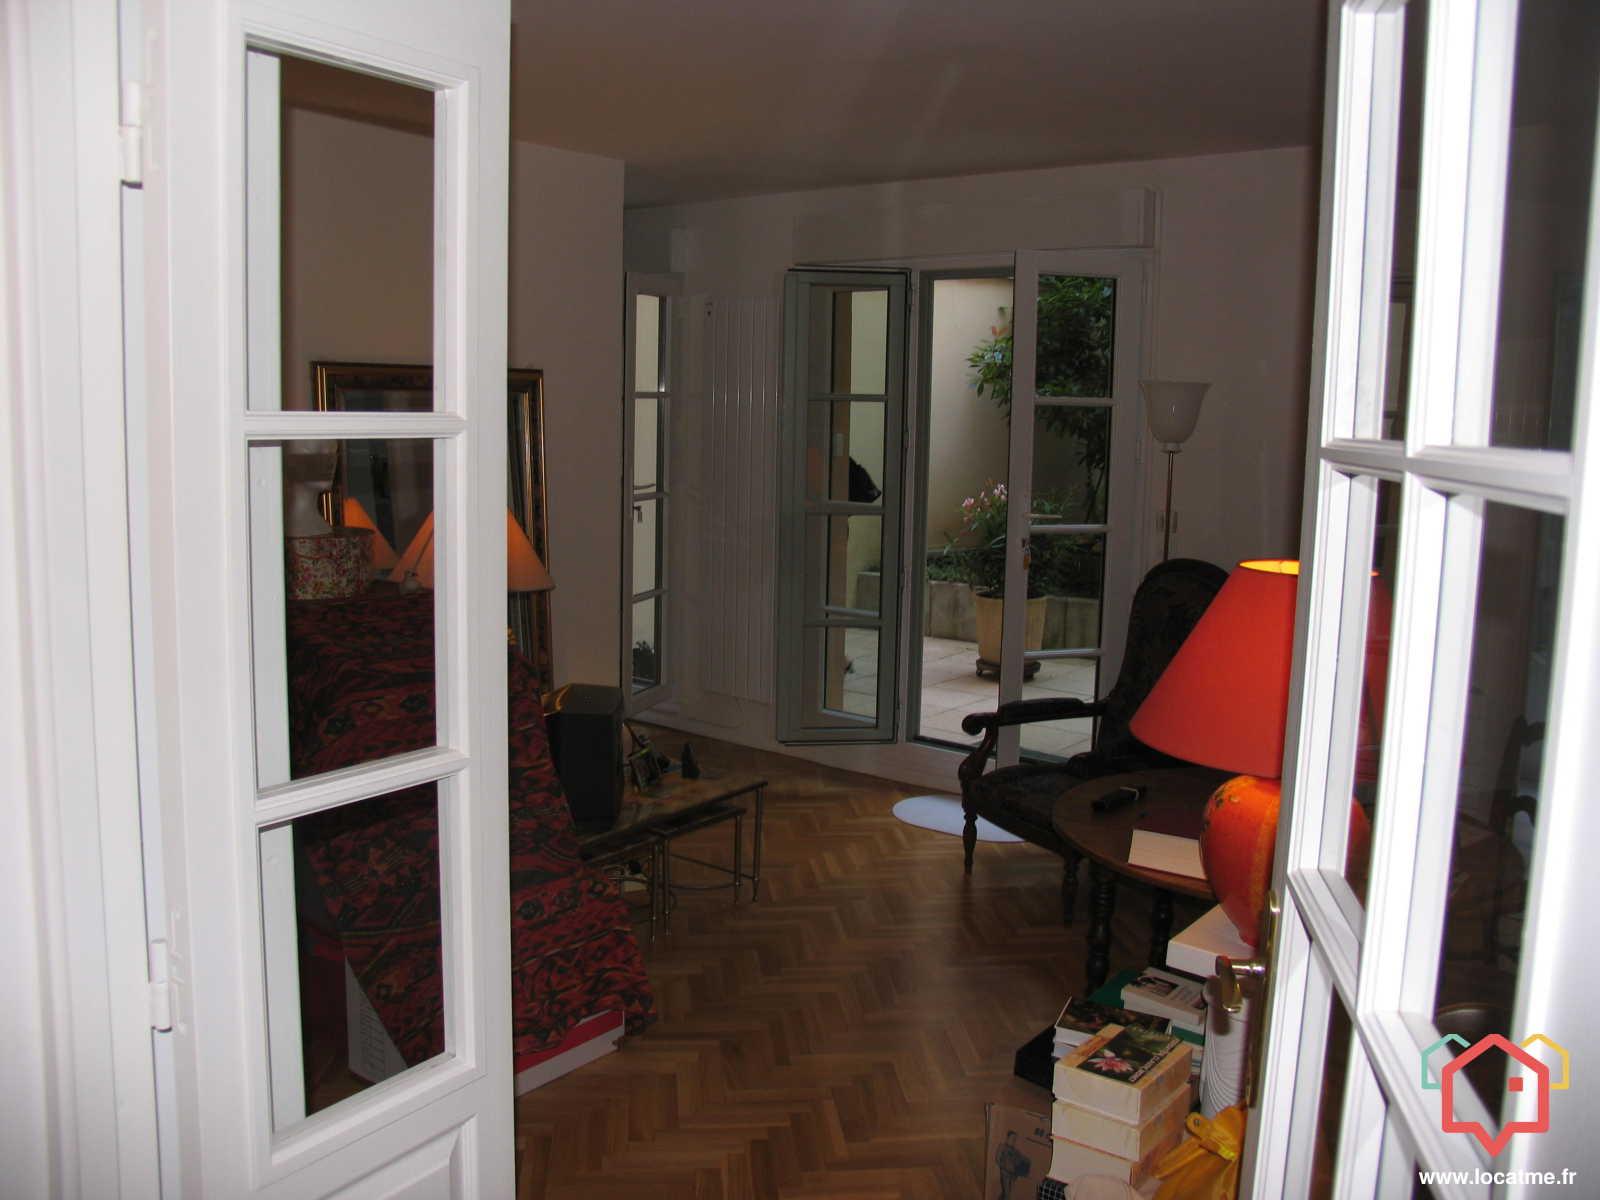 Location maison yvelines entre particulier - Location de chambre entre particulier ...